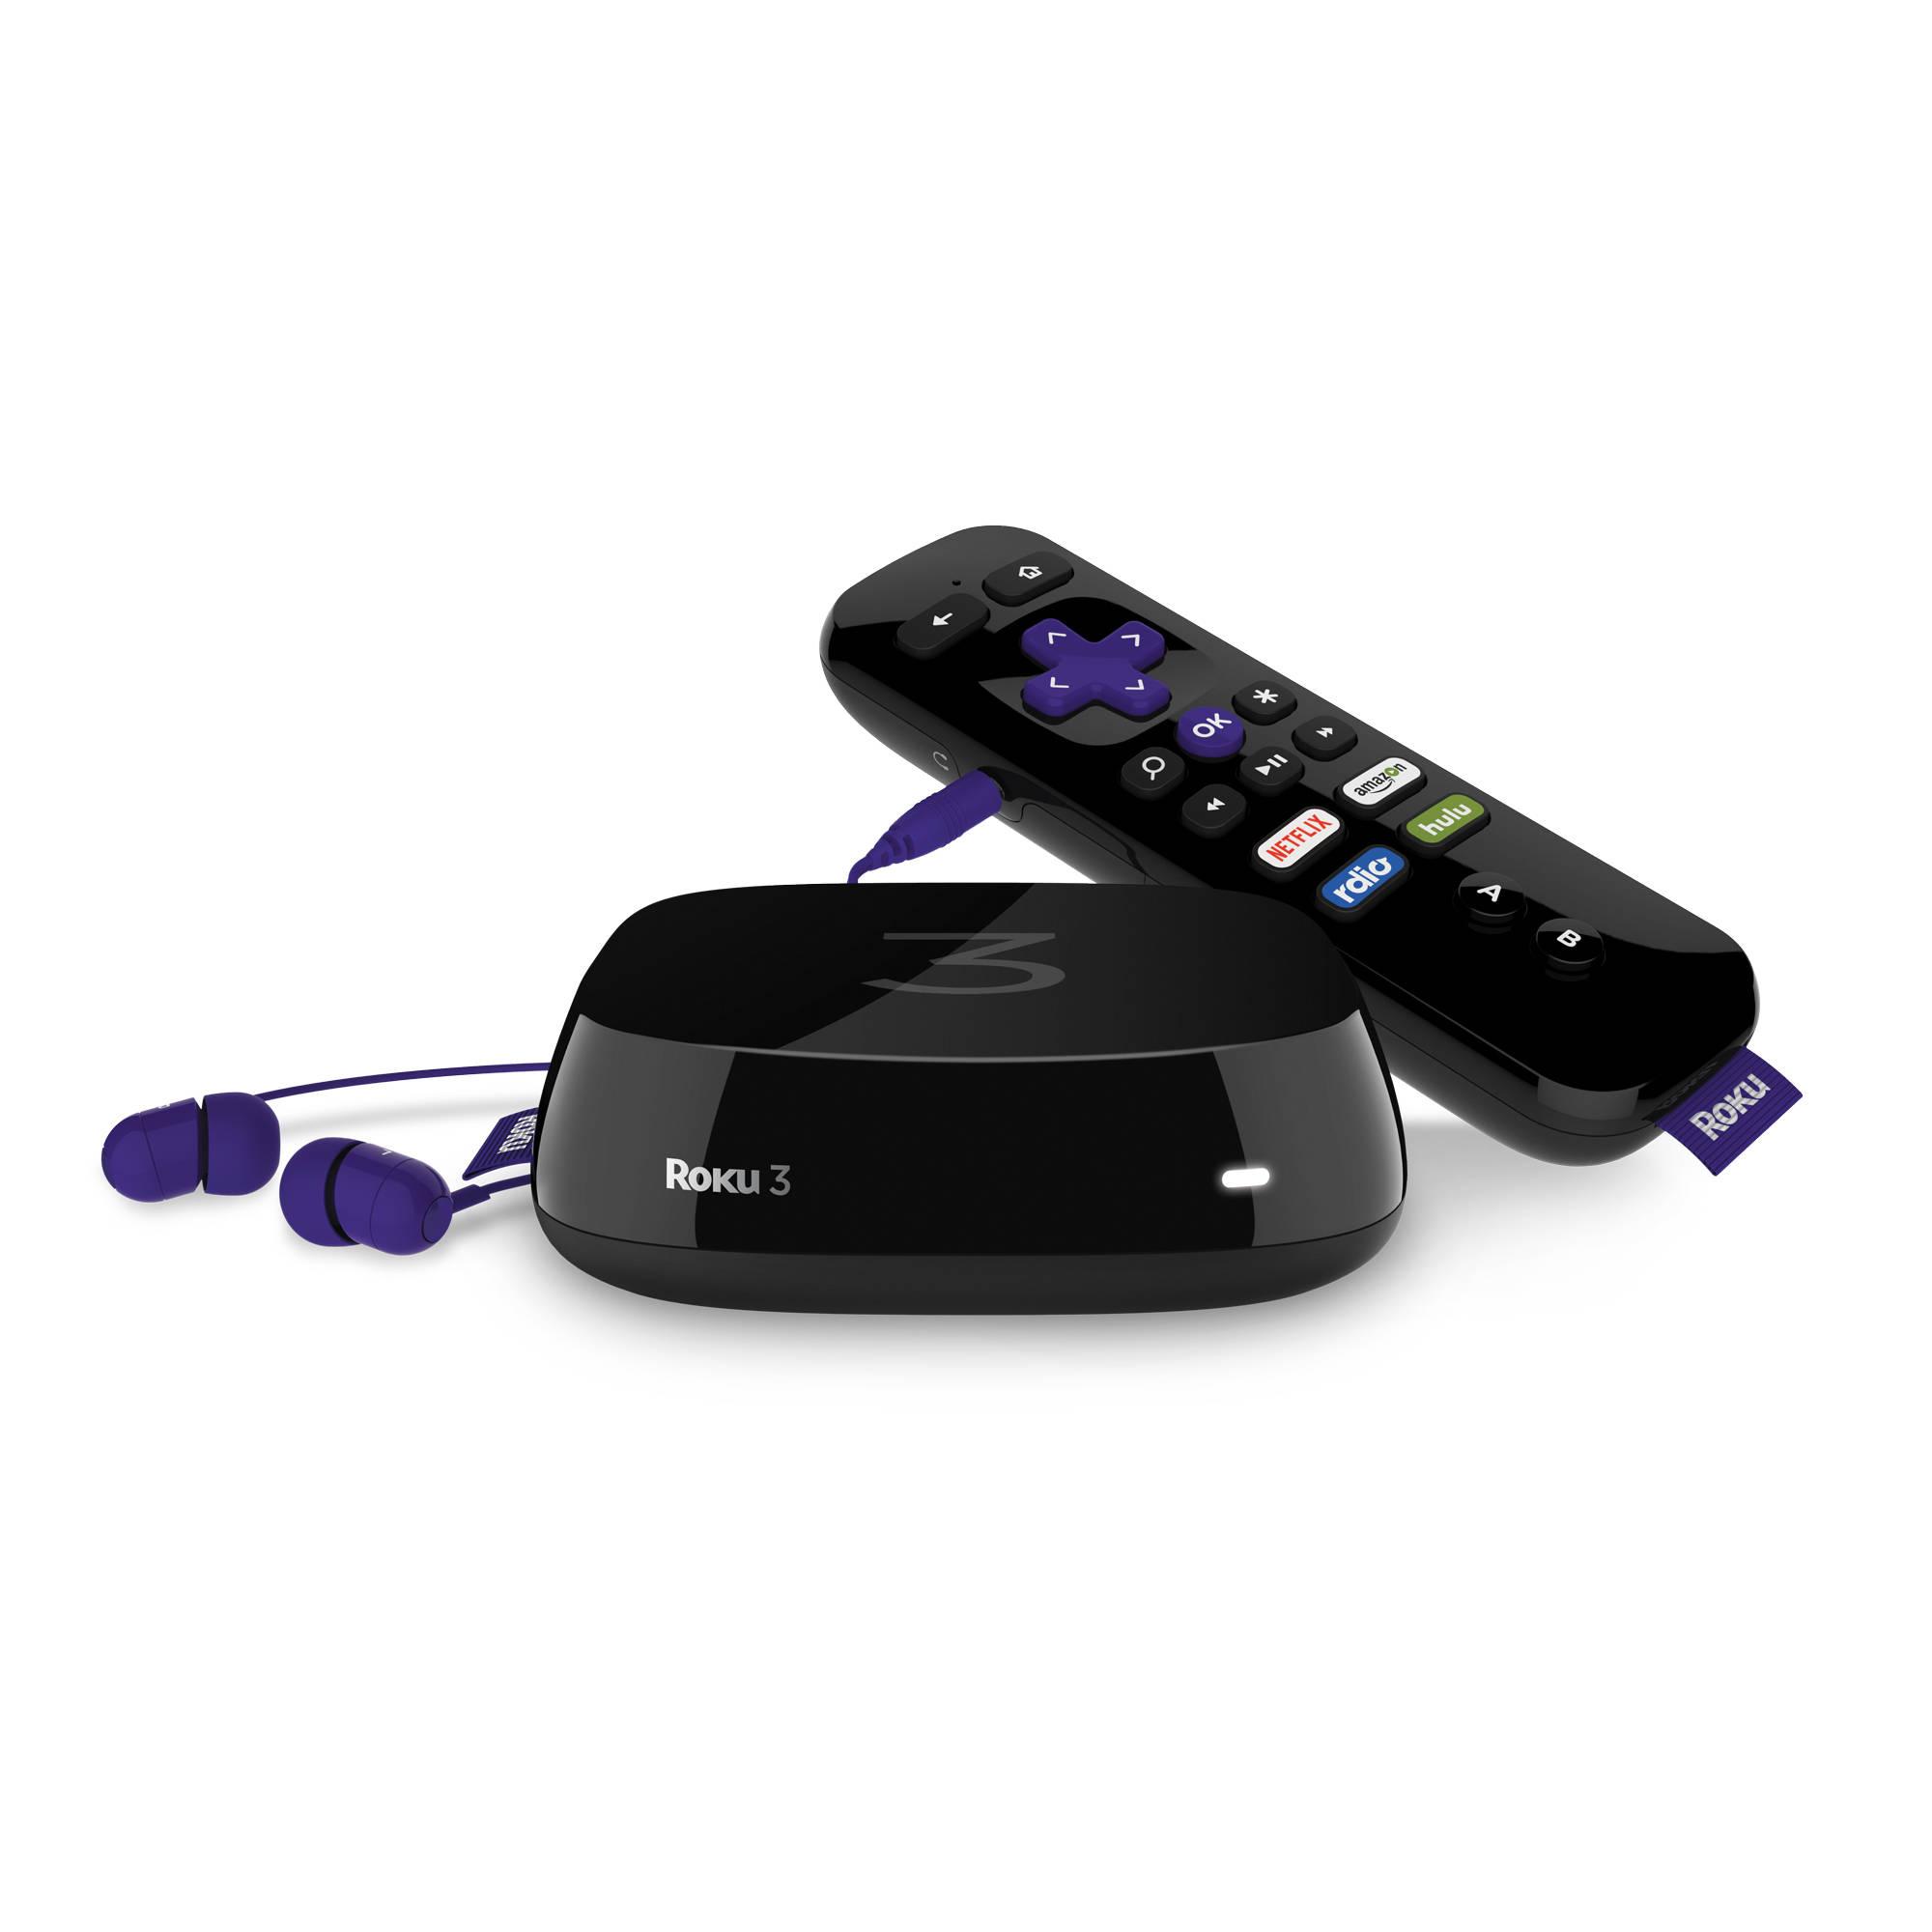 Roku 3 Streaming Player (2015 Model)